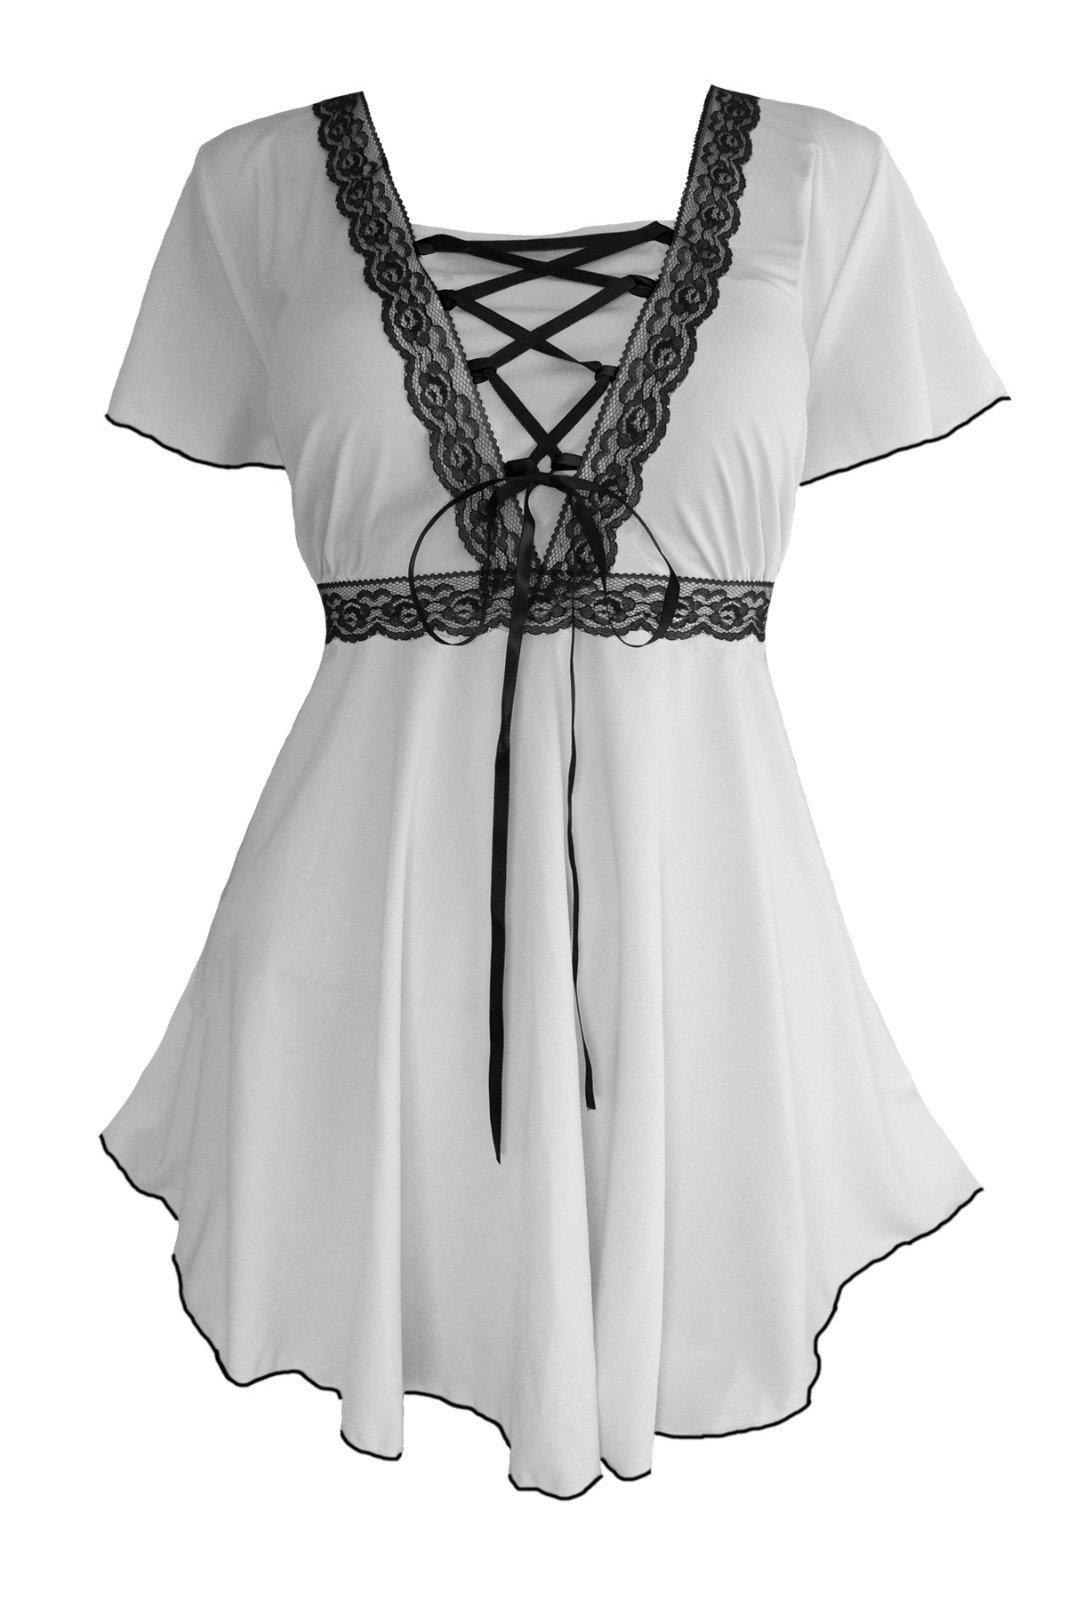 3820d9ebbb Dare to Wear Victorian Gothic Boho Women s Plus Size Angel Corset Top  White Black 4X